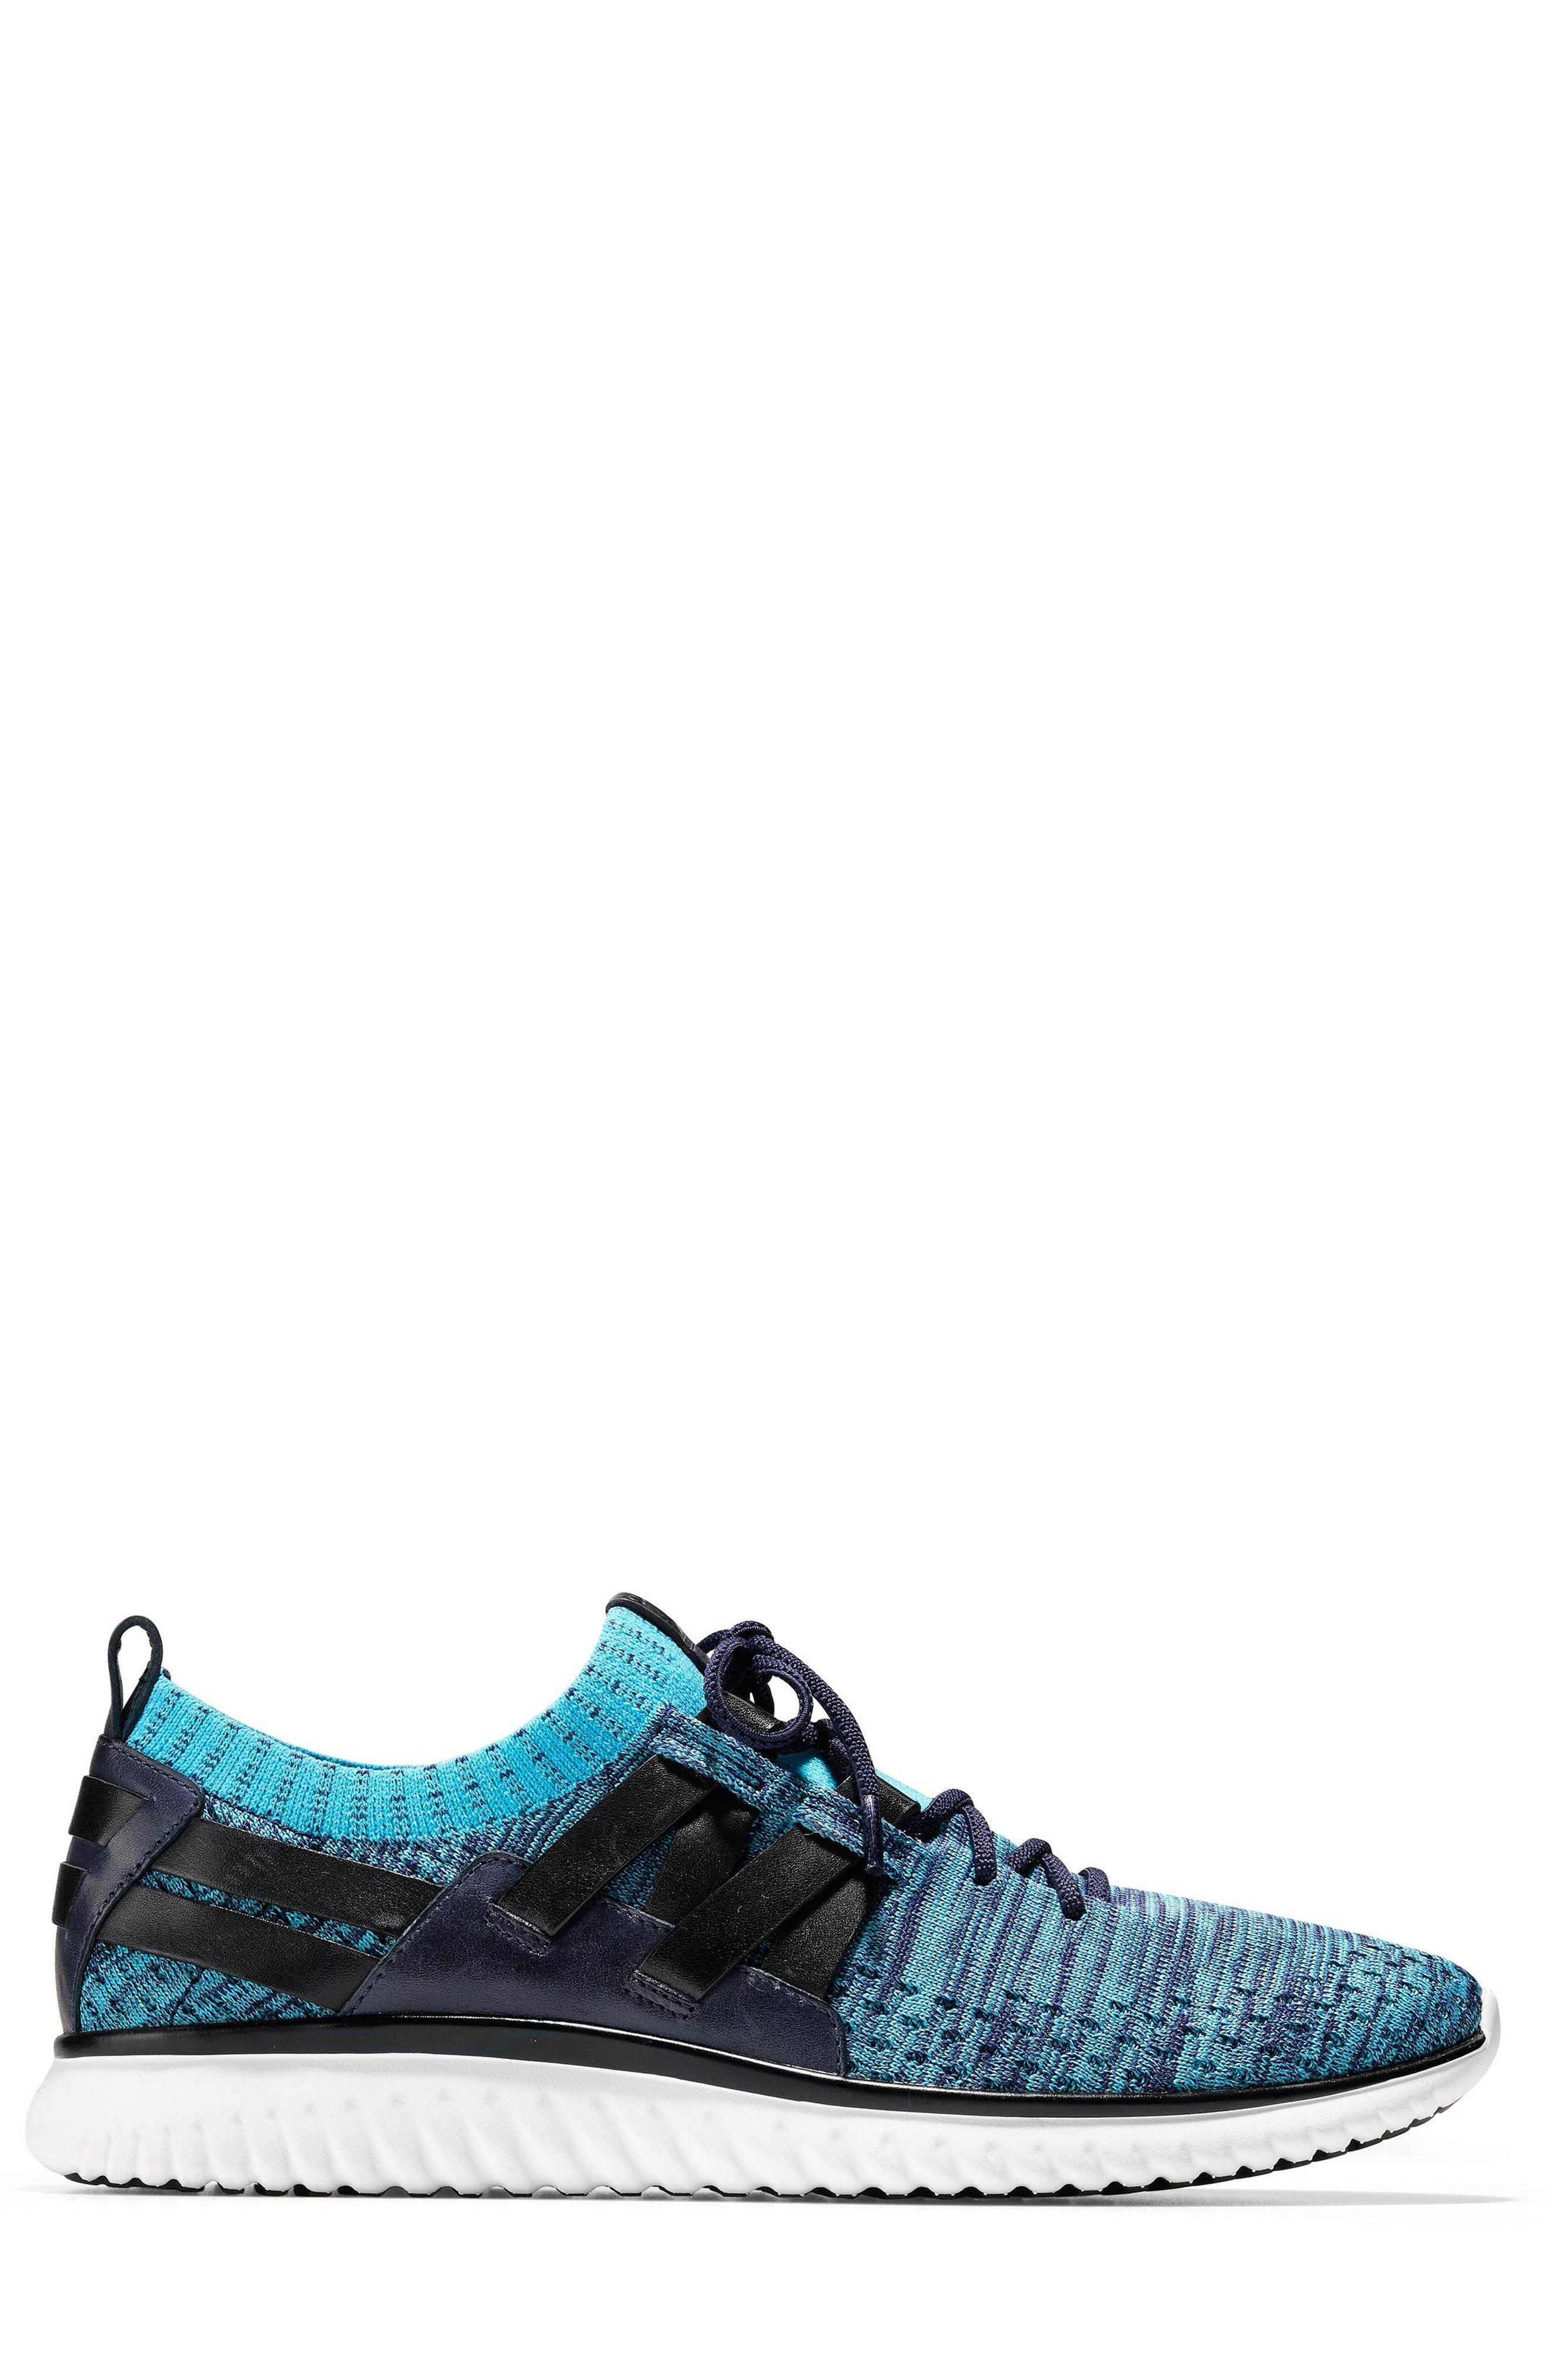 GrandMøtion Stitchlite<sup>™</sup> Woven Sneaker,                             Alternate thumbnail 3, color,                             Marine Blue